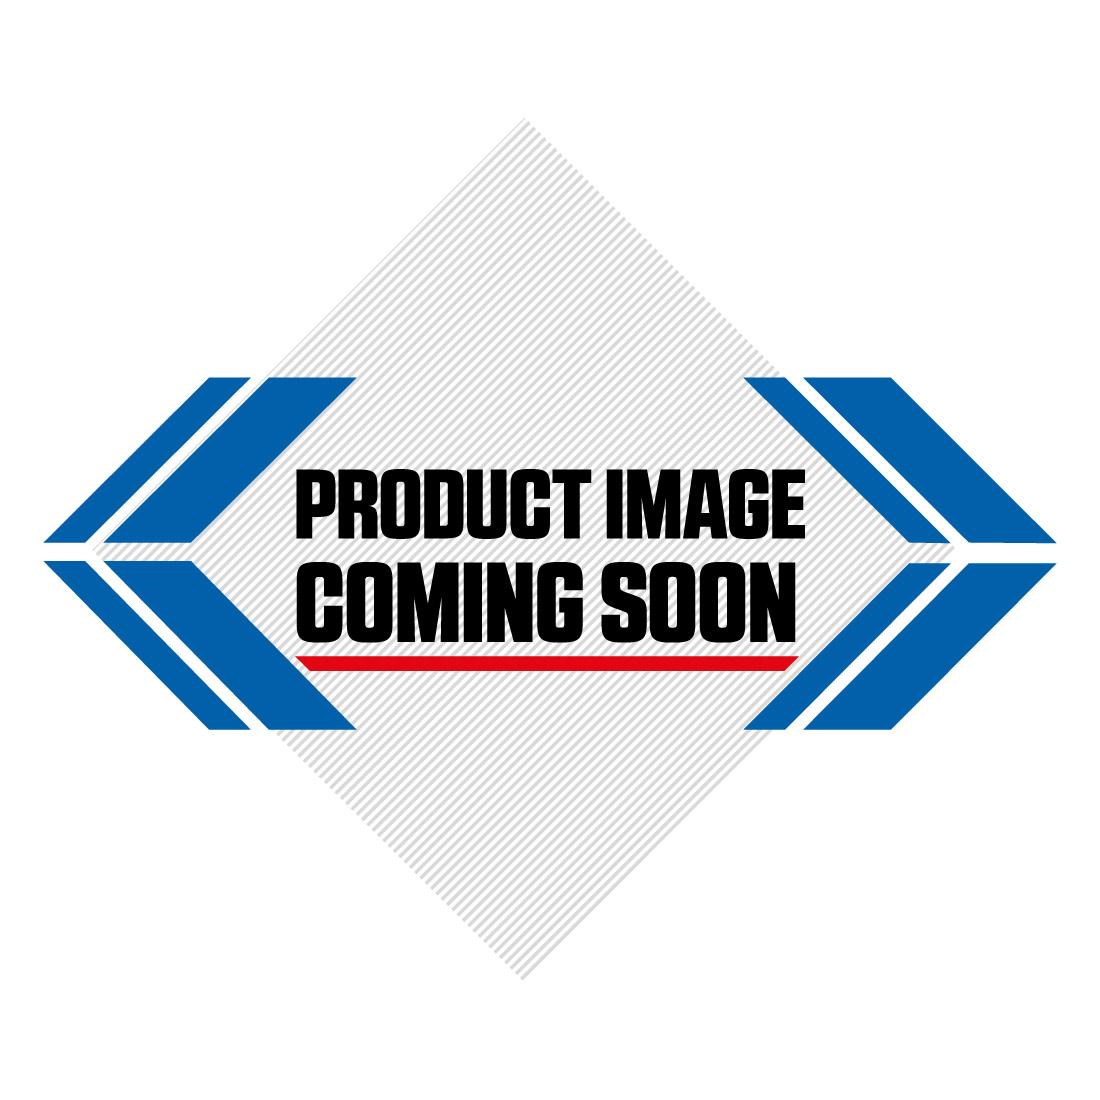 Suzuki Plastic Kit RMZ 450 (08-17) White Image-4>